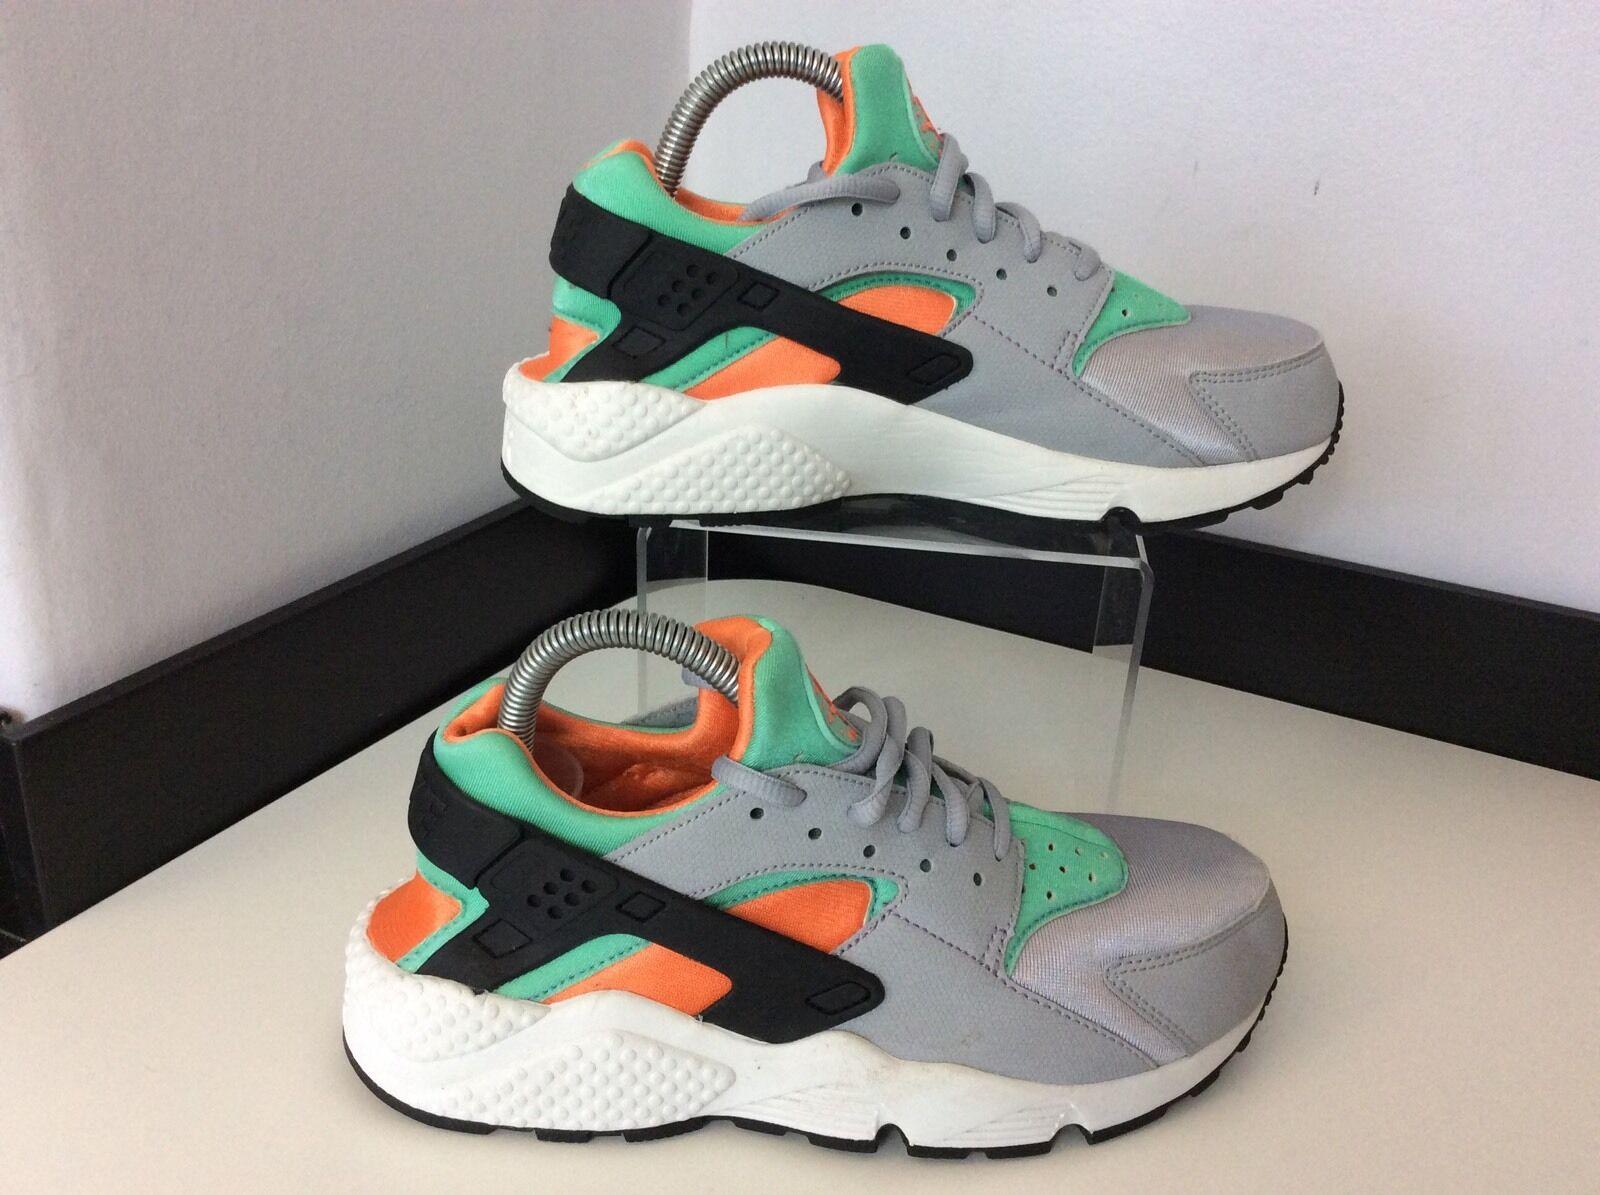 Nike Air Huarache Trainers Size 38.5 Uk 5 Vgc Unisex Running Fitness Grey